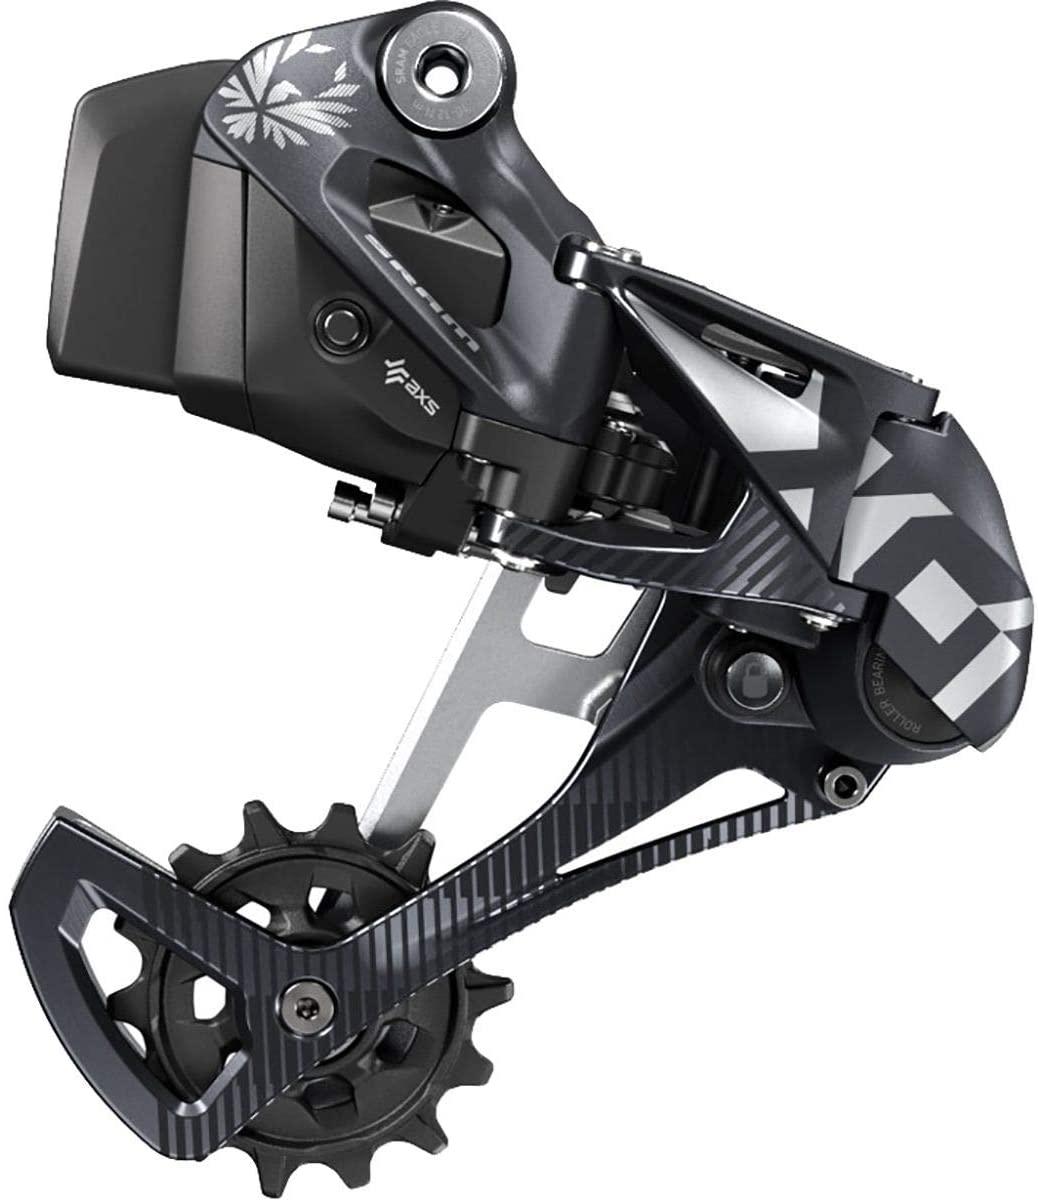 SRAM X01 Eagle AXS 12-Speed Rear Derailleur